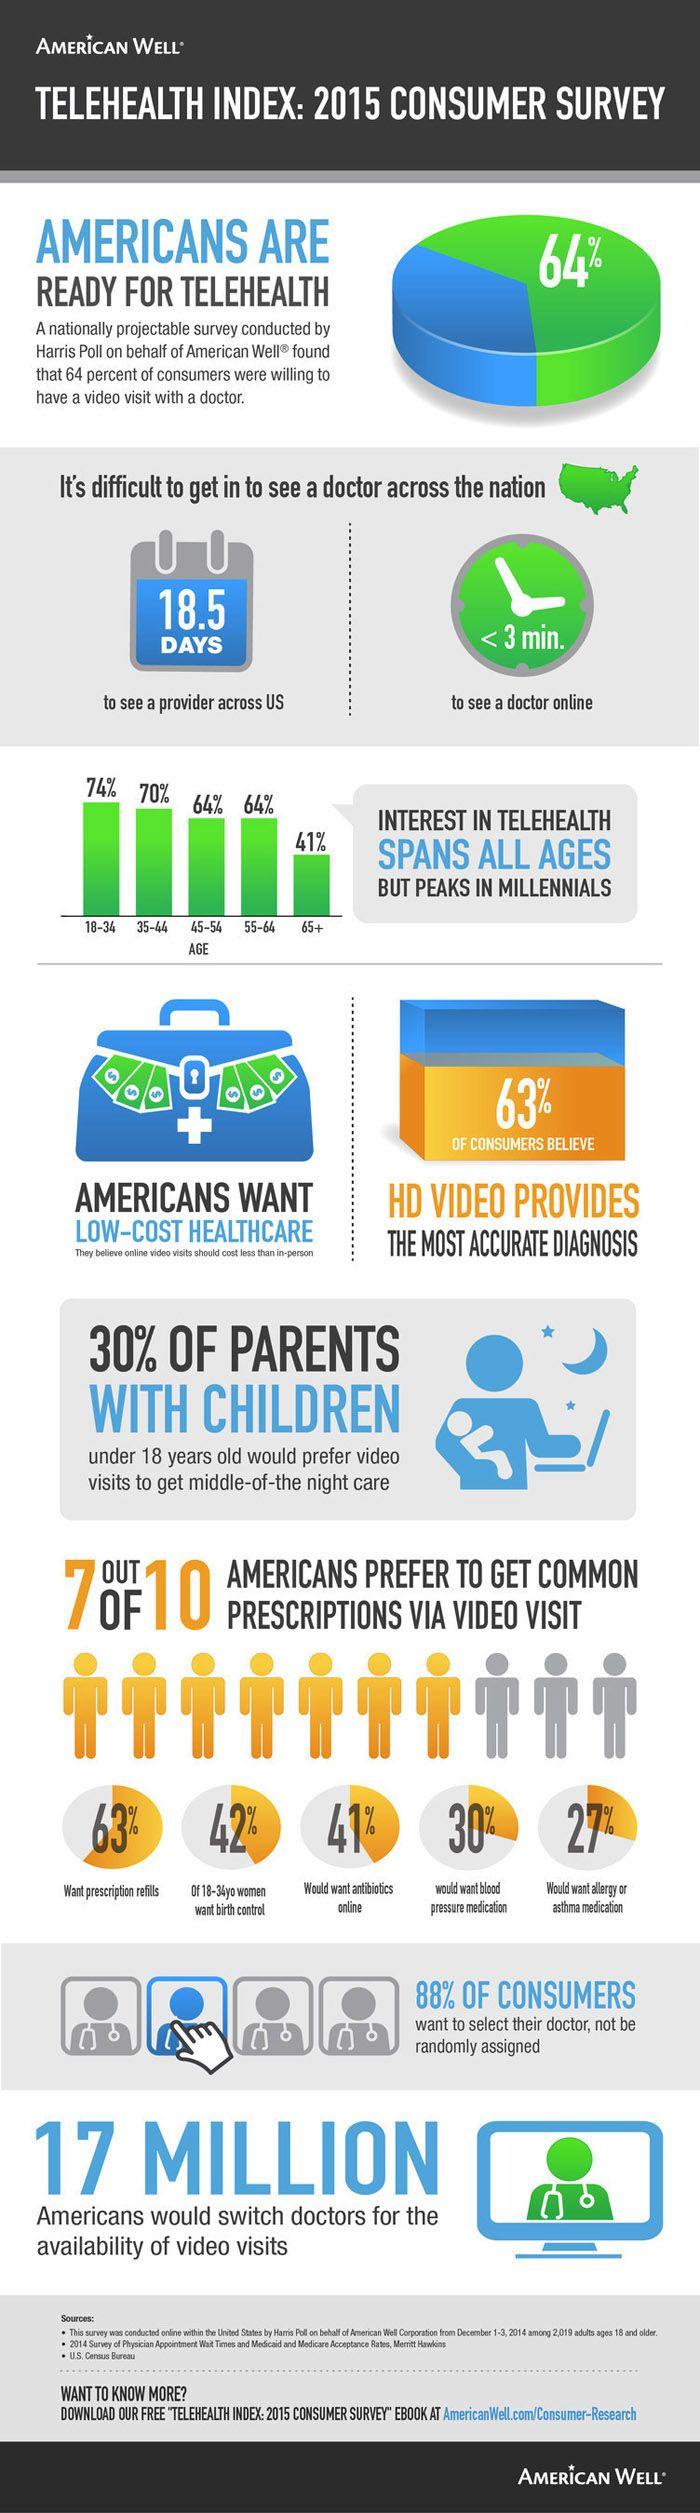 Telehealth 2015 consumer survey